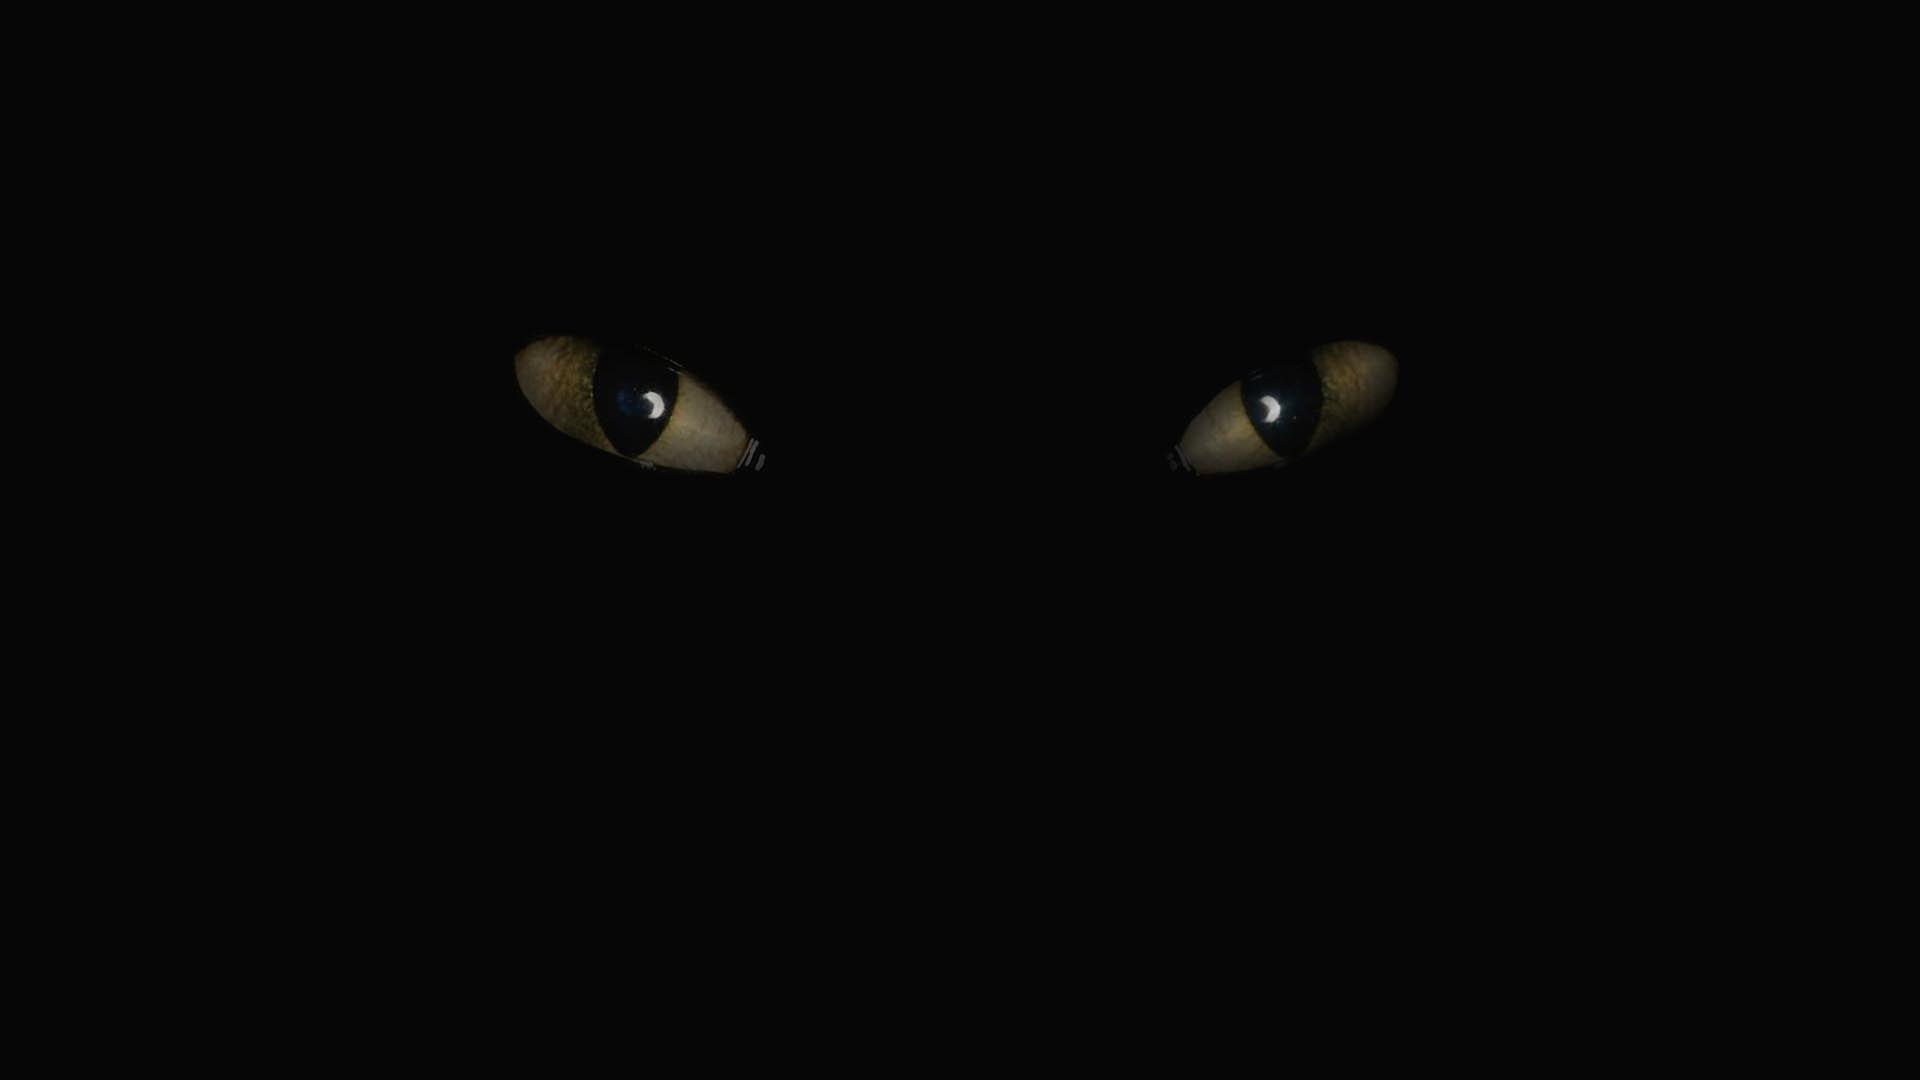 Фото кота в сапогах из сказки шарля перро рисунок без